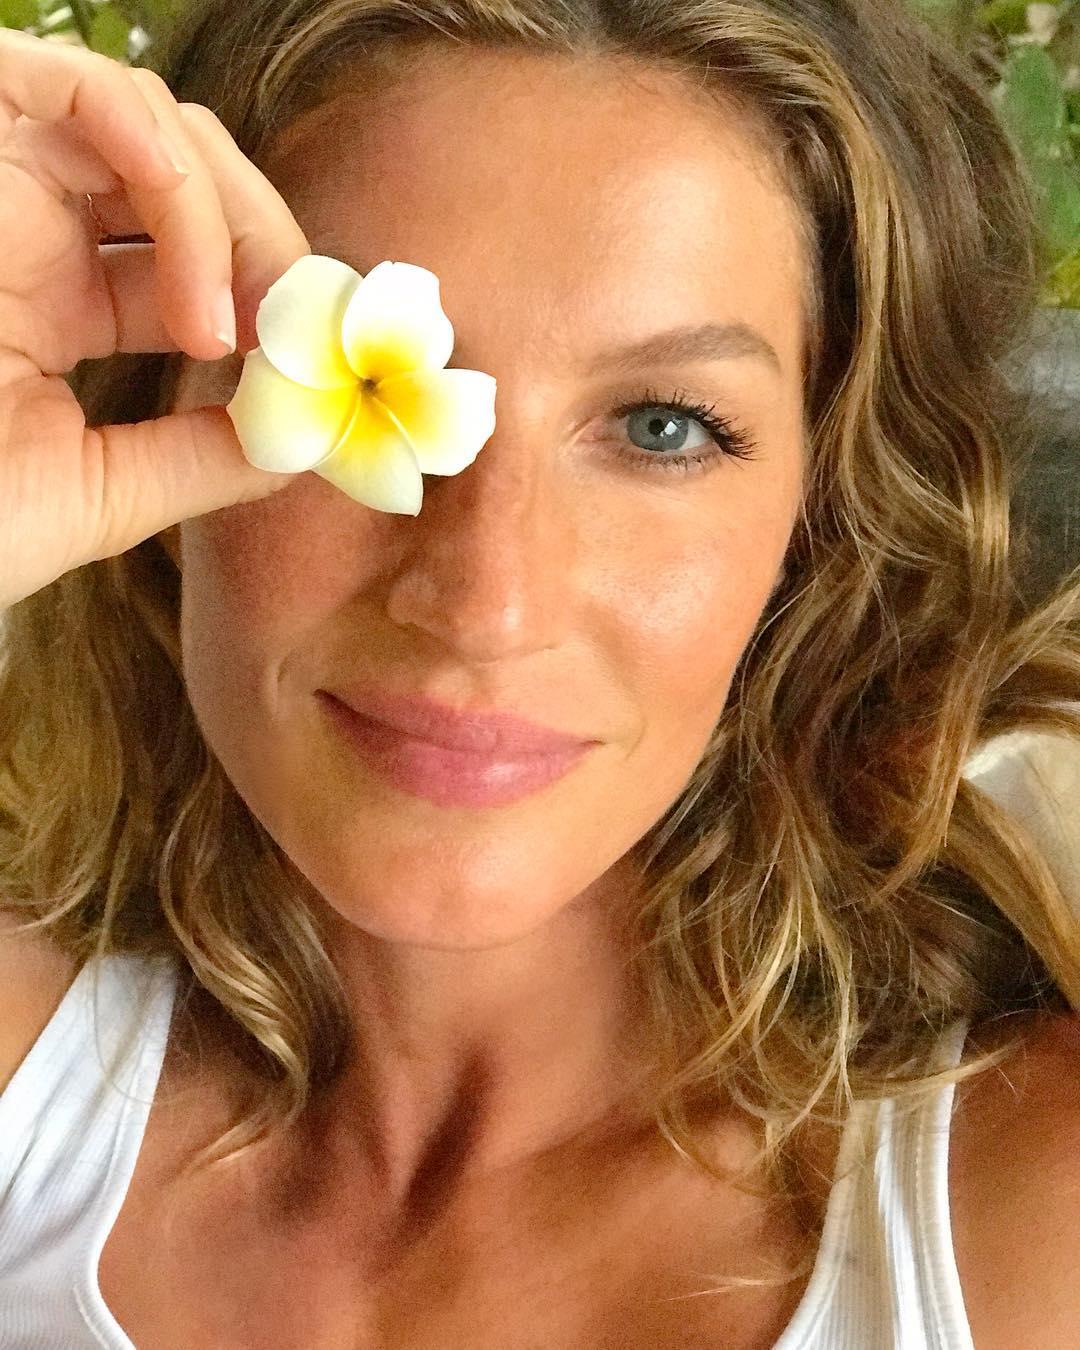 Tα πιο έξυπνα make up tips για να δείχνεις νεότερη